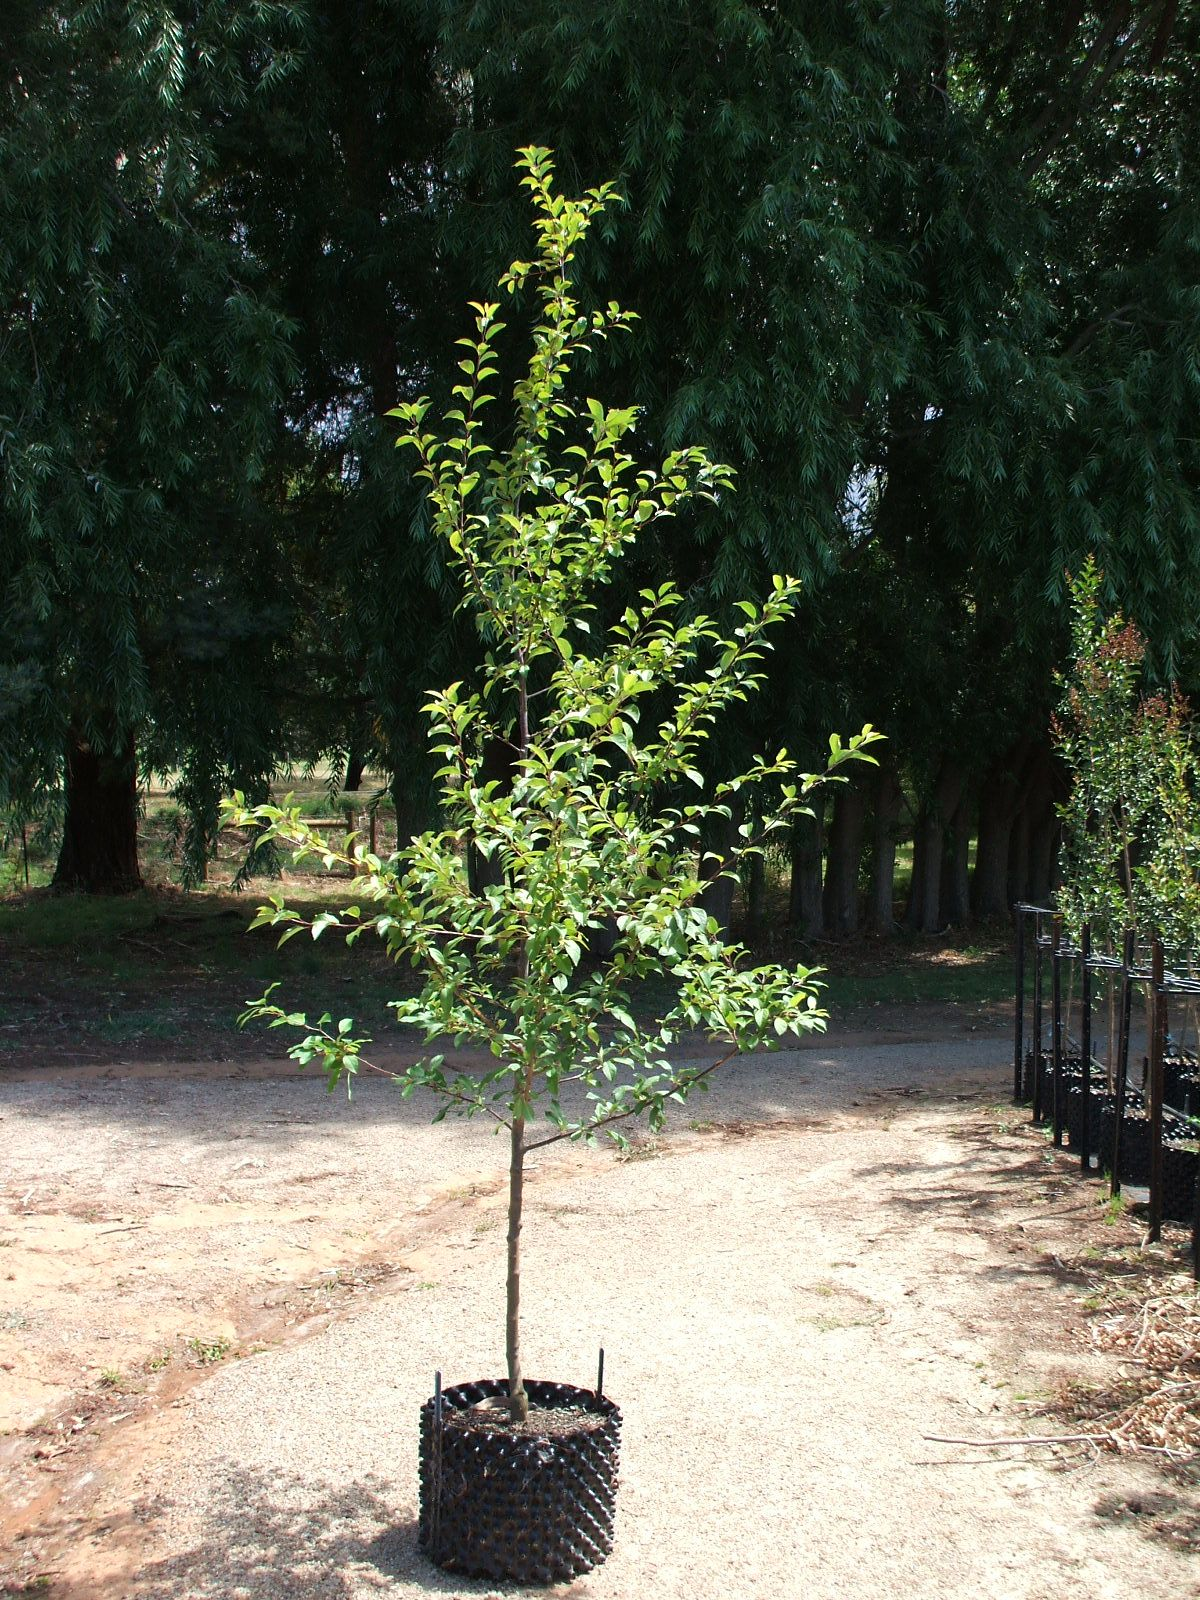 Malus Floribunda Size Height 5m Spread 5m Habit Small Tree With